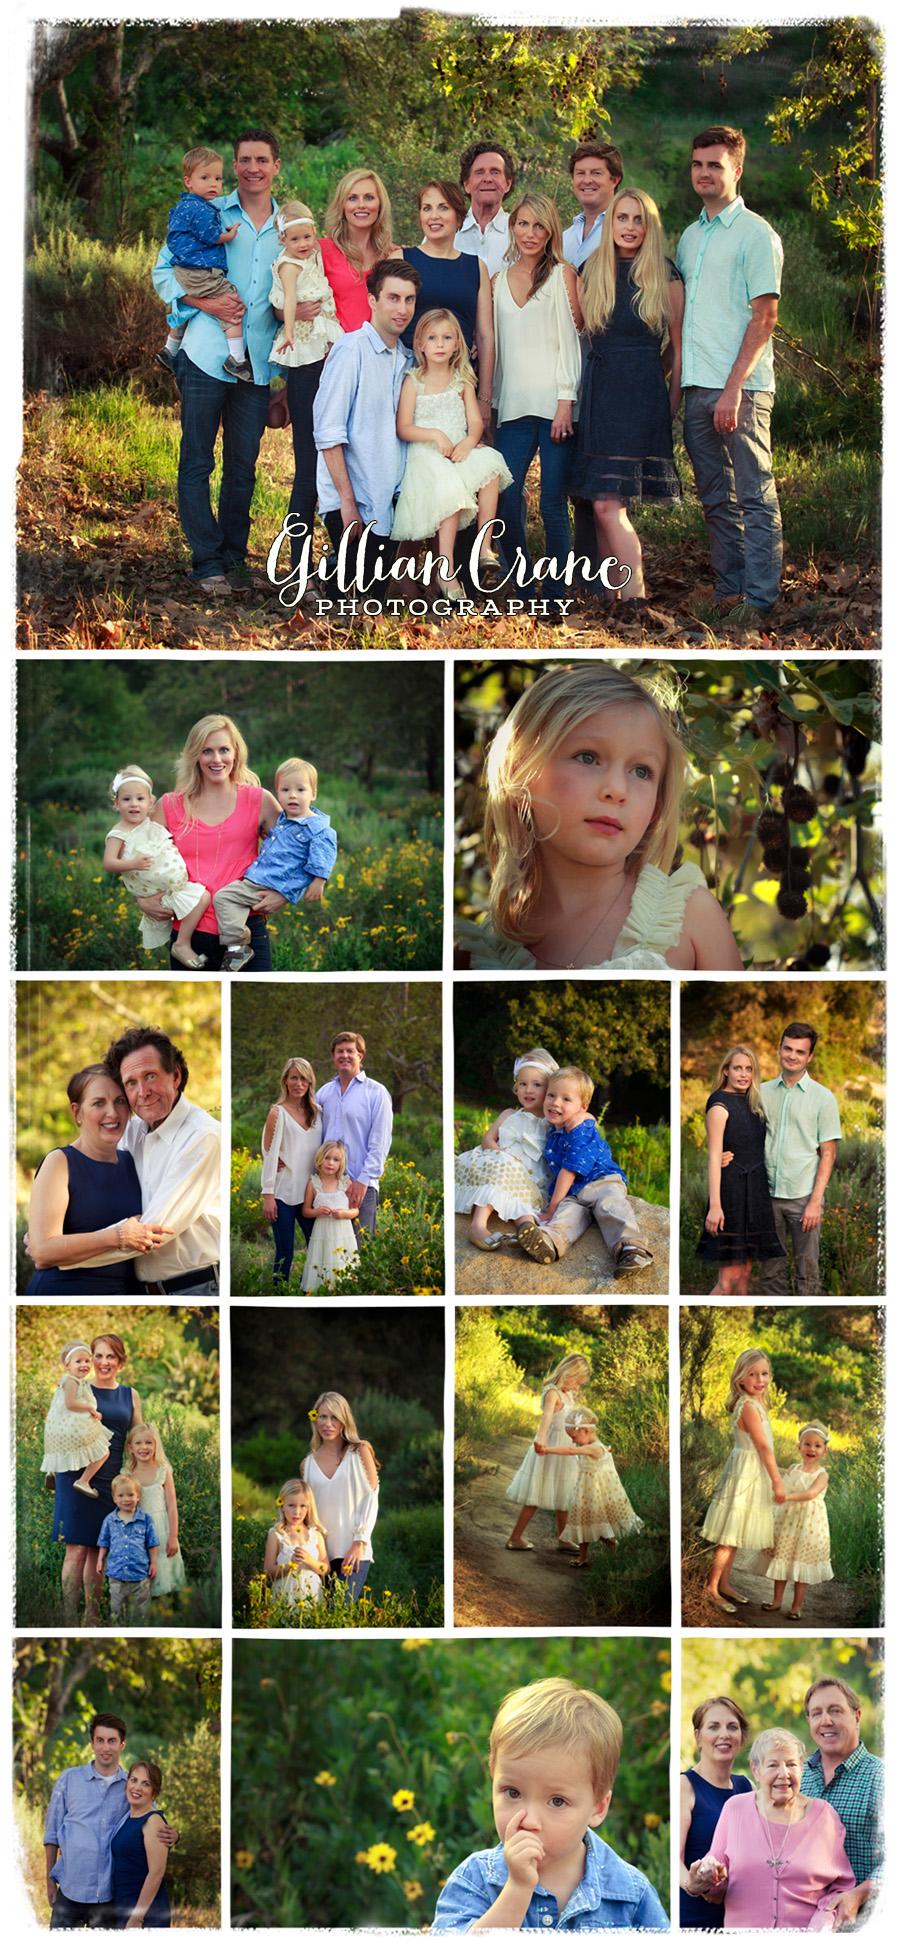 gillian-crane-laguna-beach-orange-county-extended-family-portrait-photographers-blog